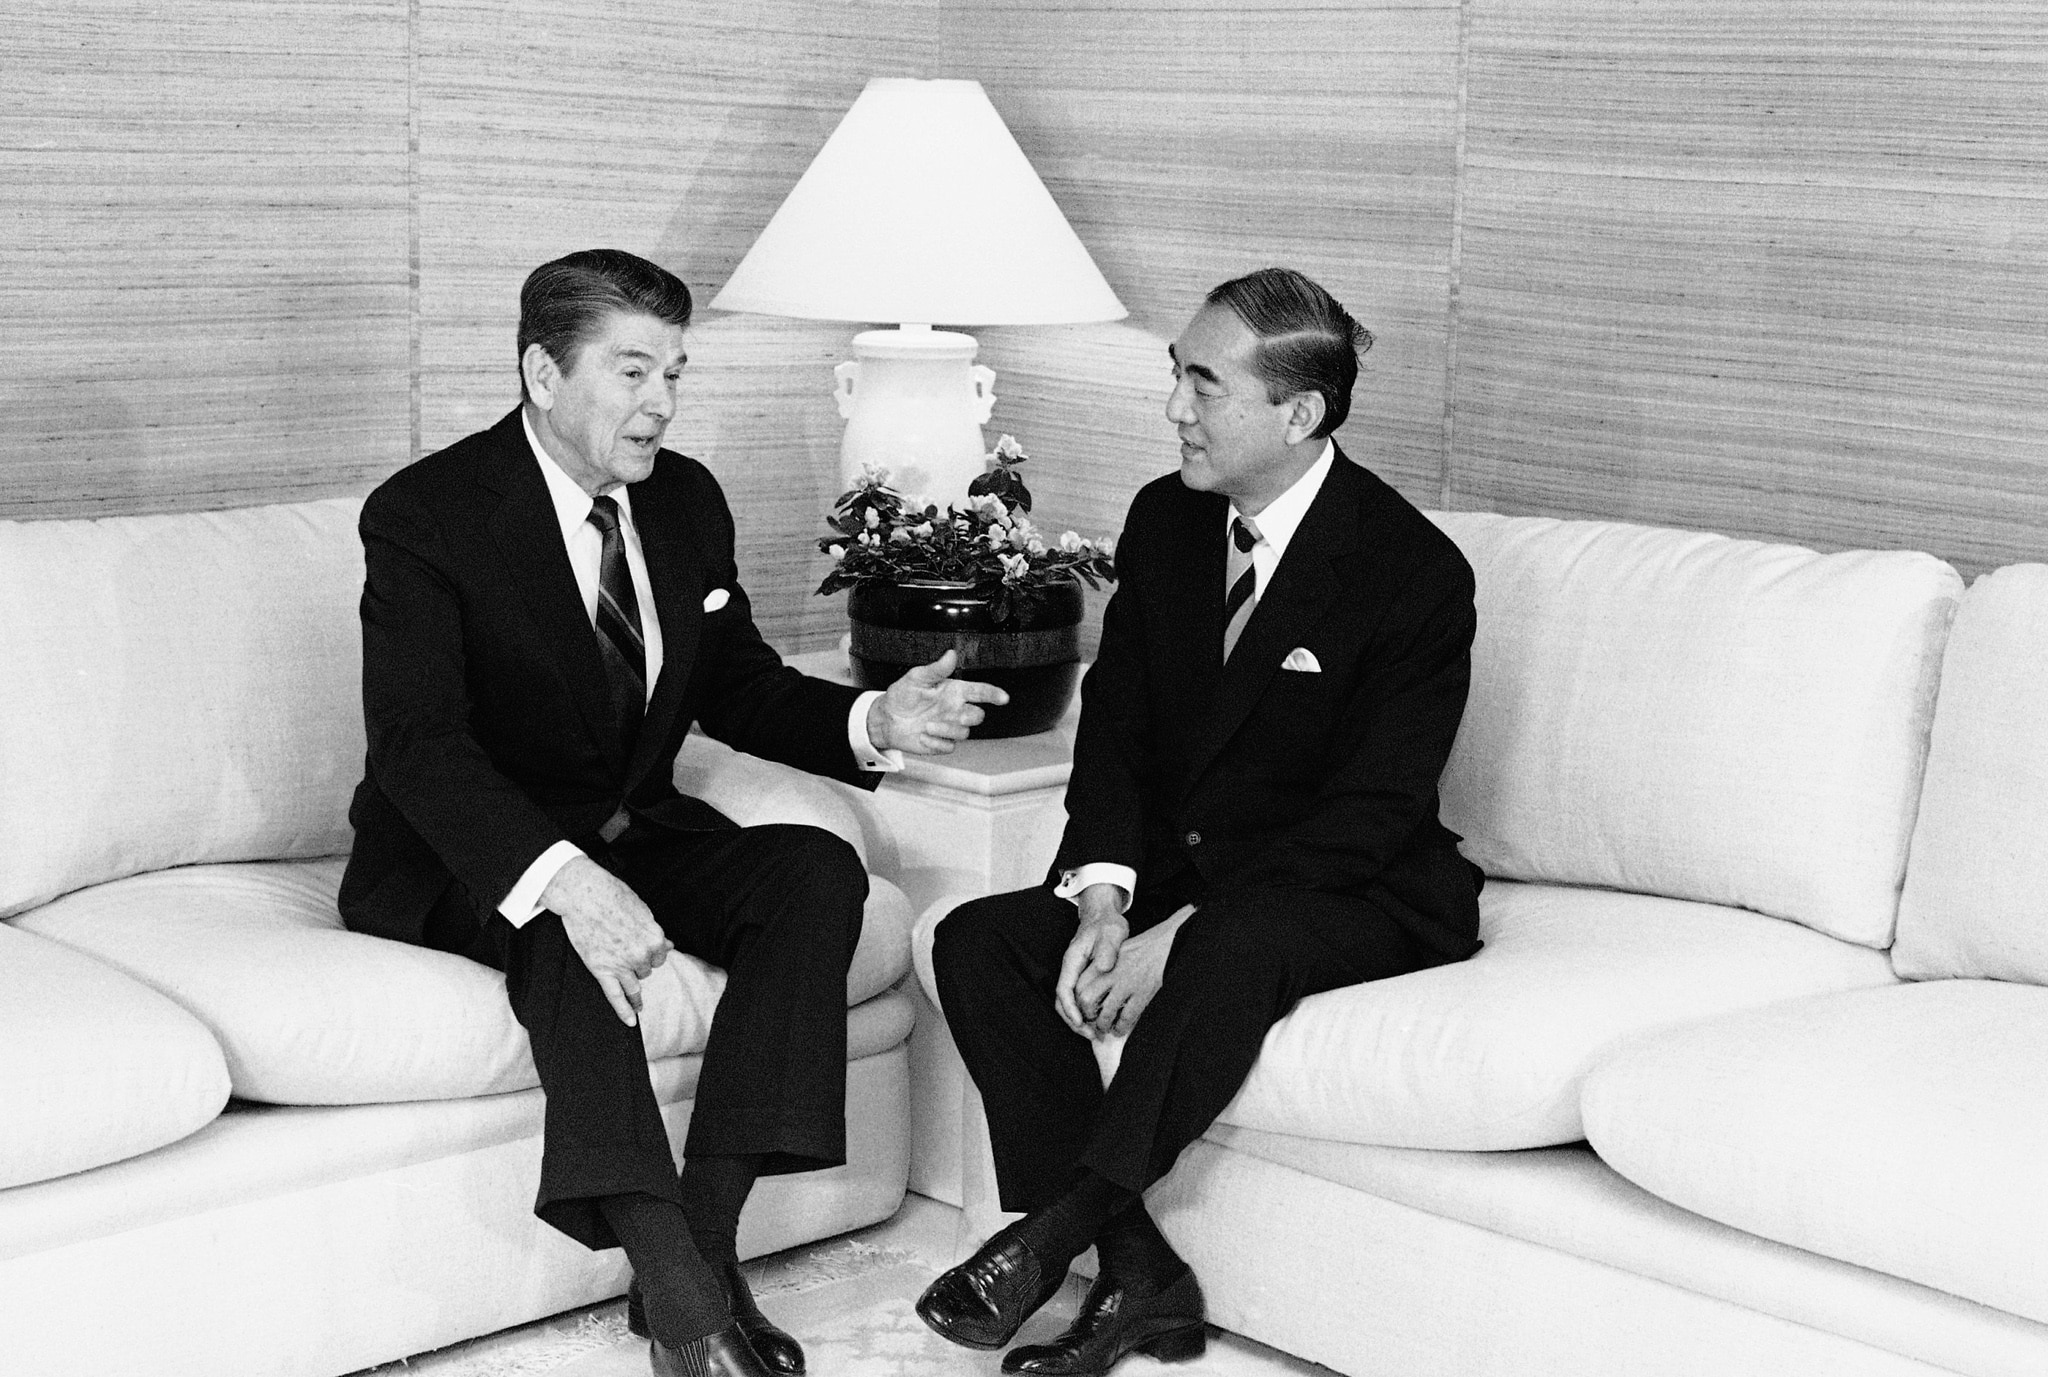 Ronald Reagan and Yasuhiro Nakasone sitting on a couch (© Ira Schwartz/AP Images)